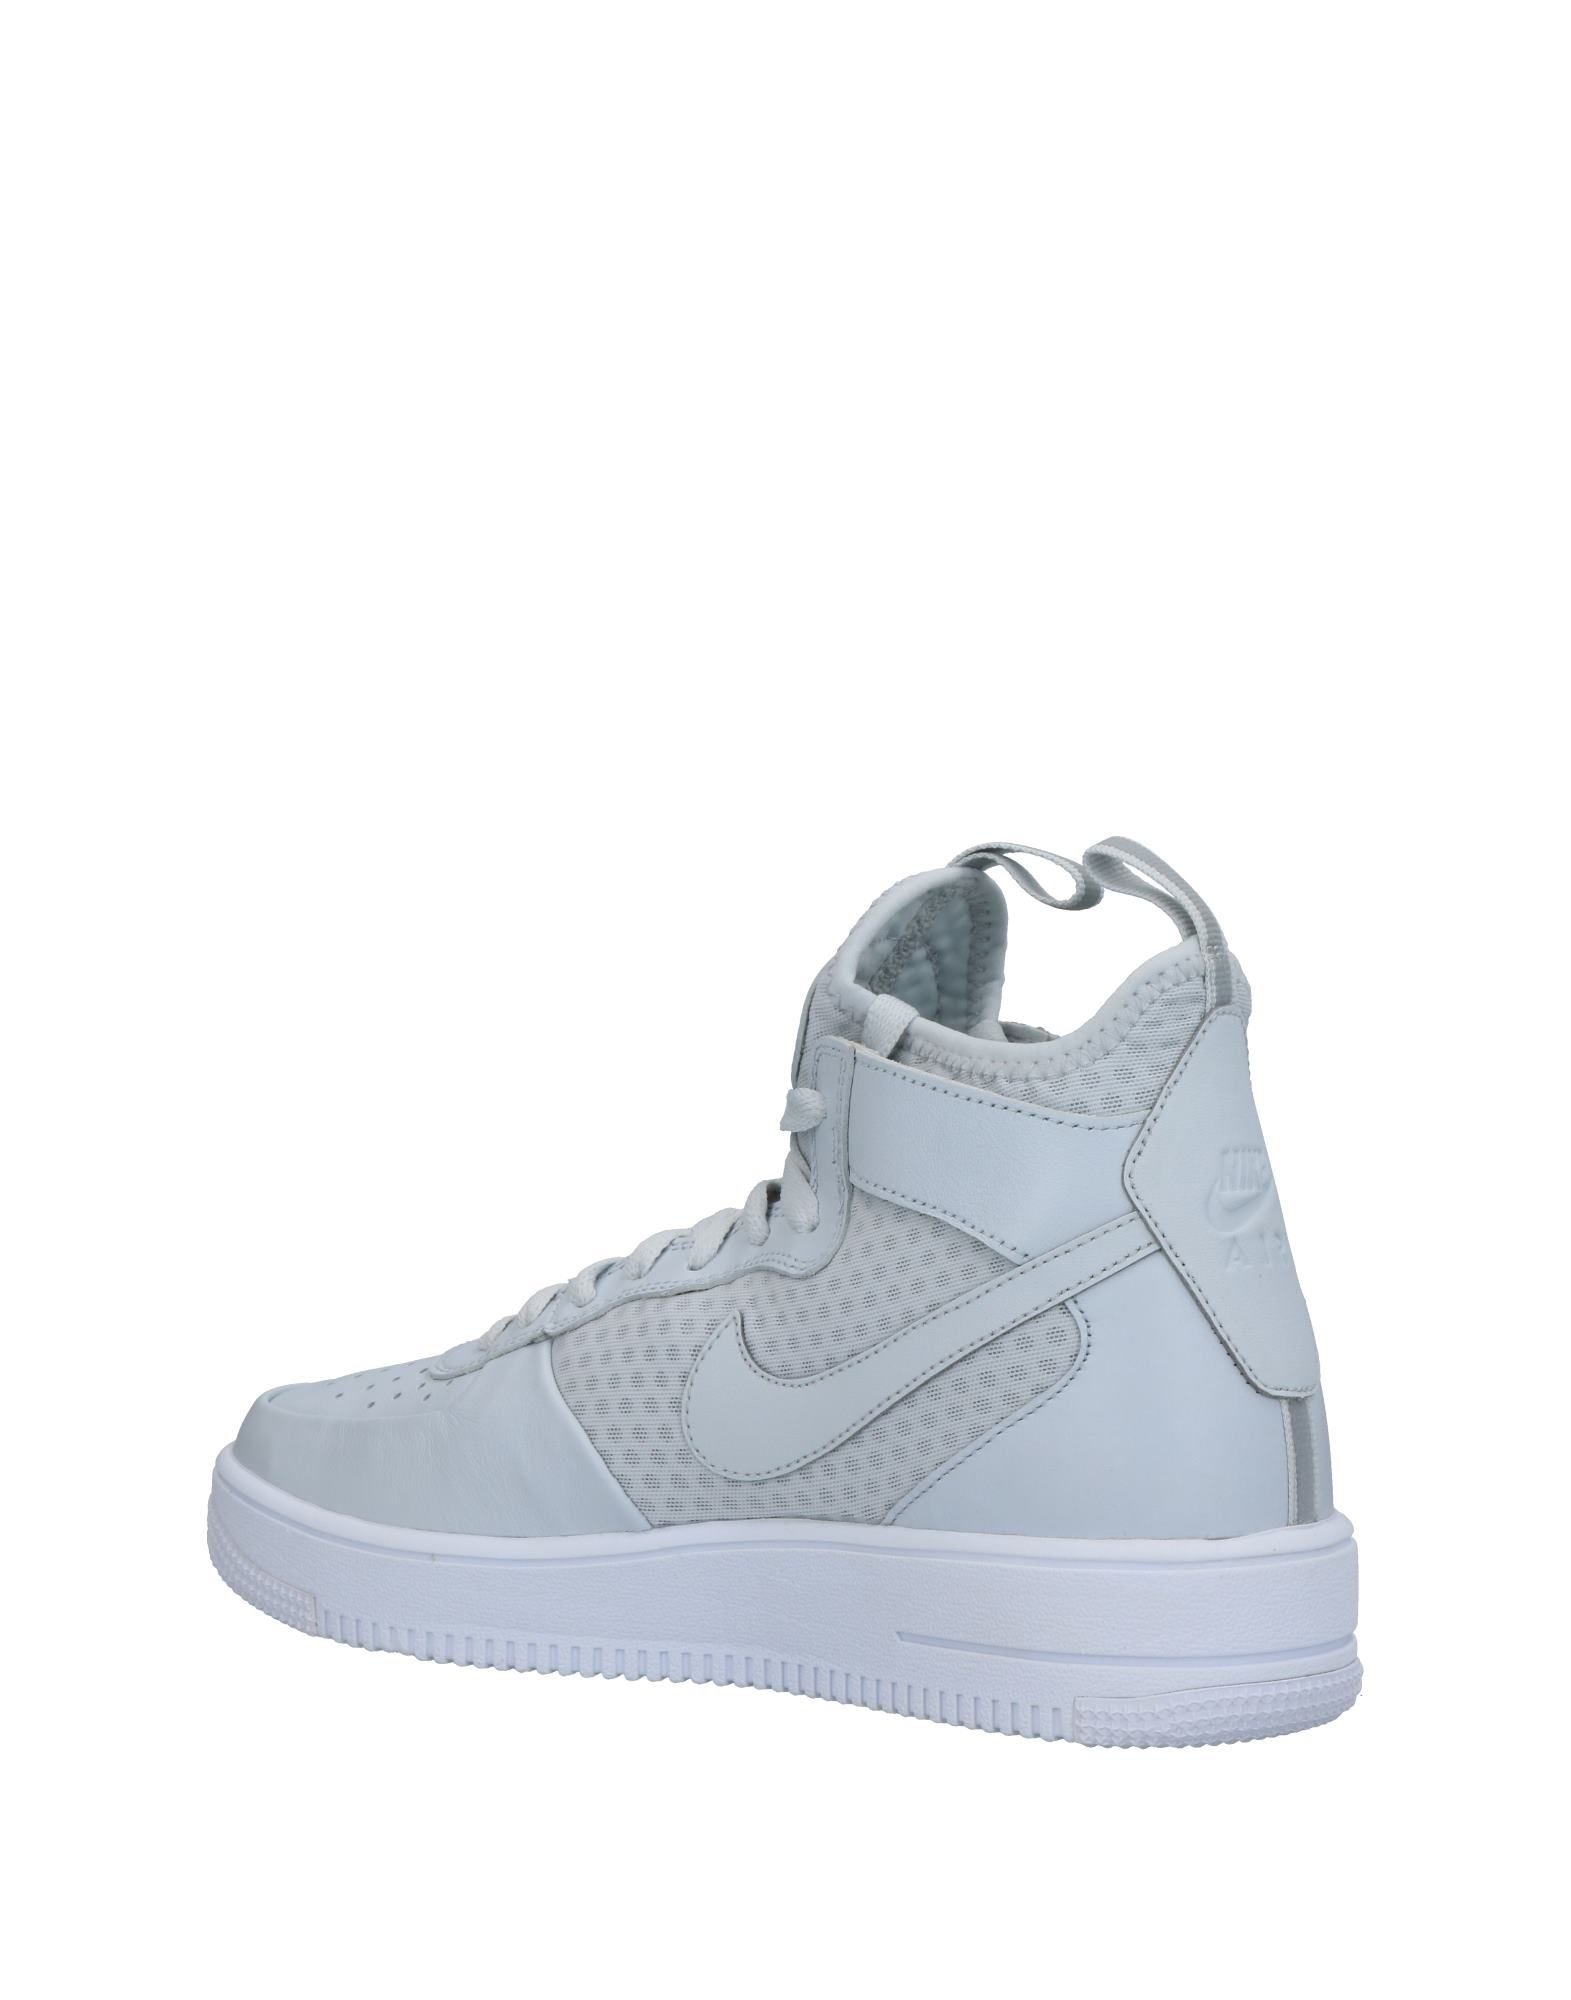 Nike Sneakers Sneakers Nike Herren  11335567KS 50aeea